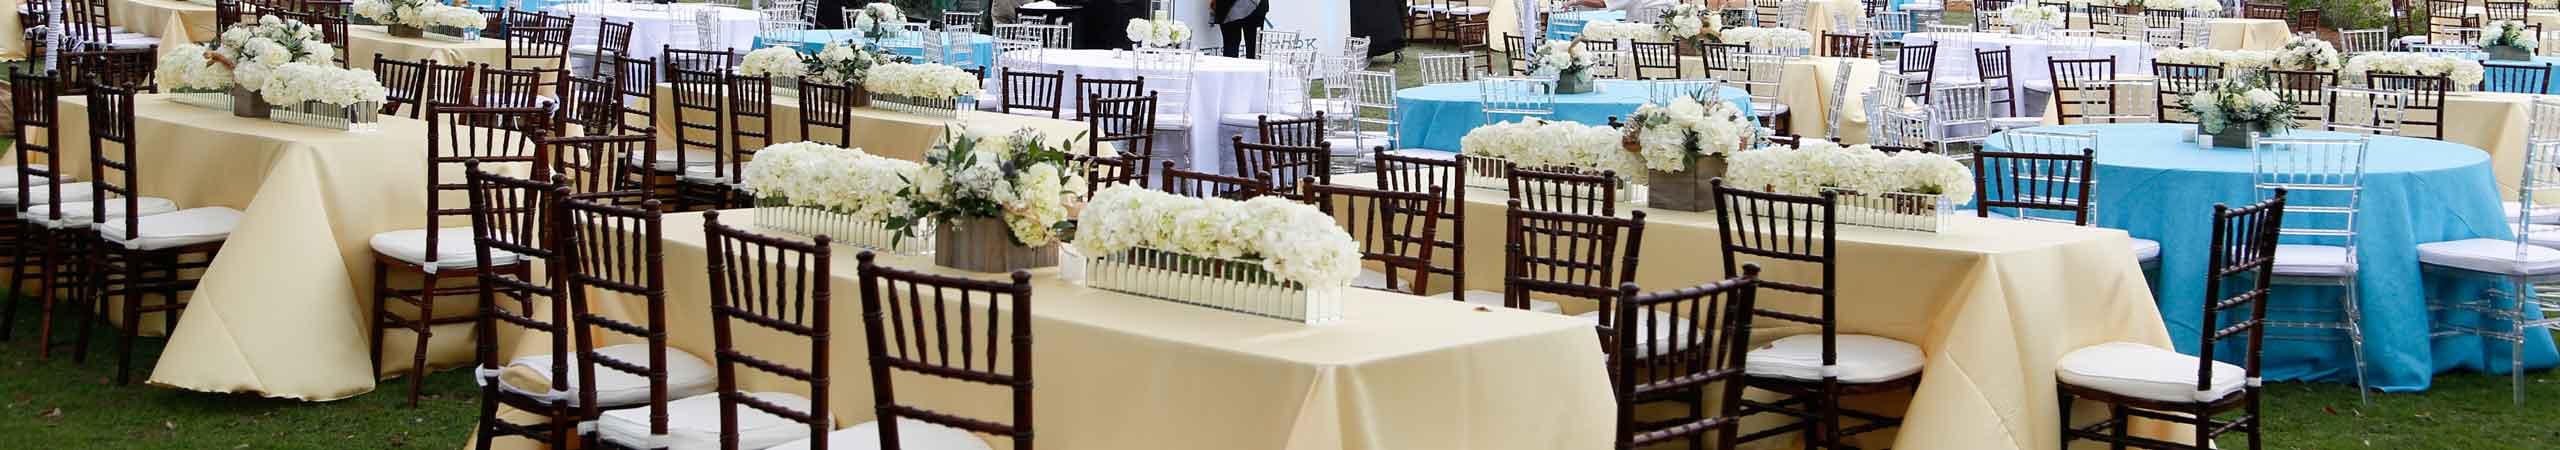 Jacksonville Table Rentals